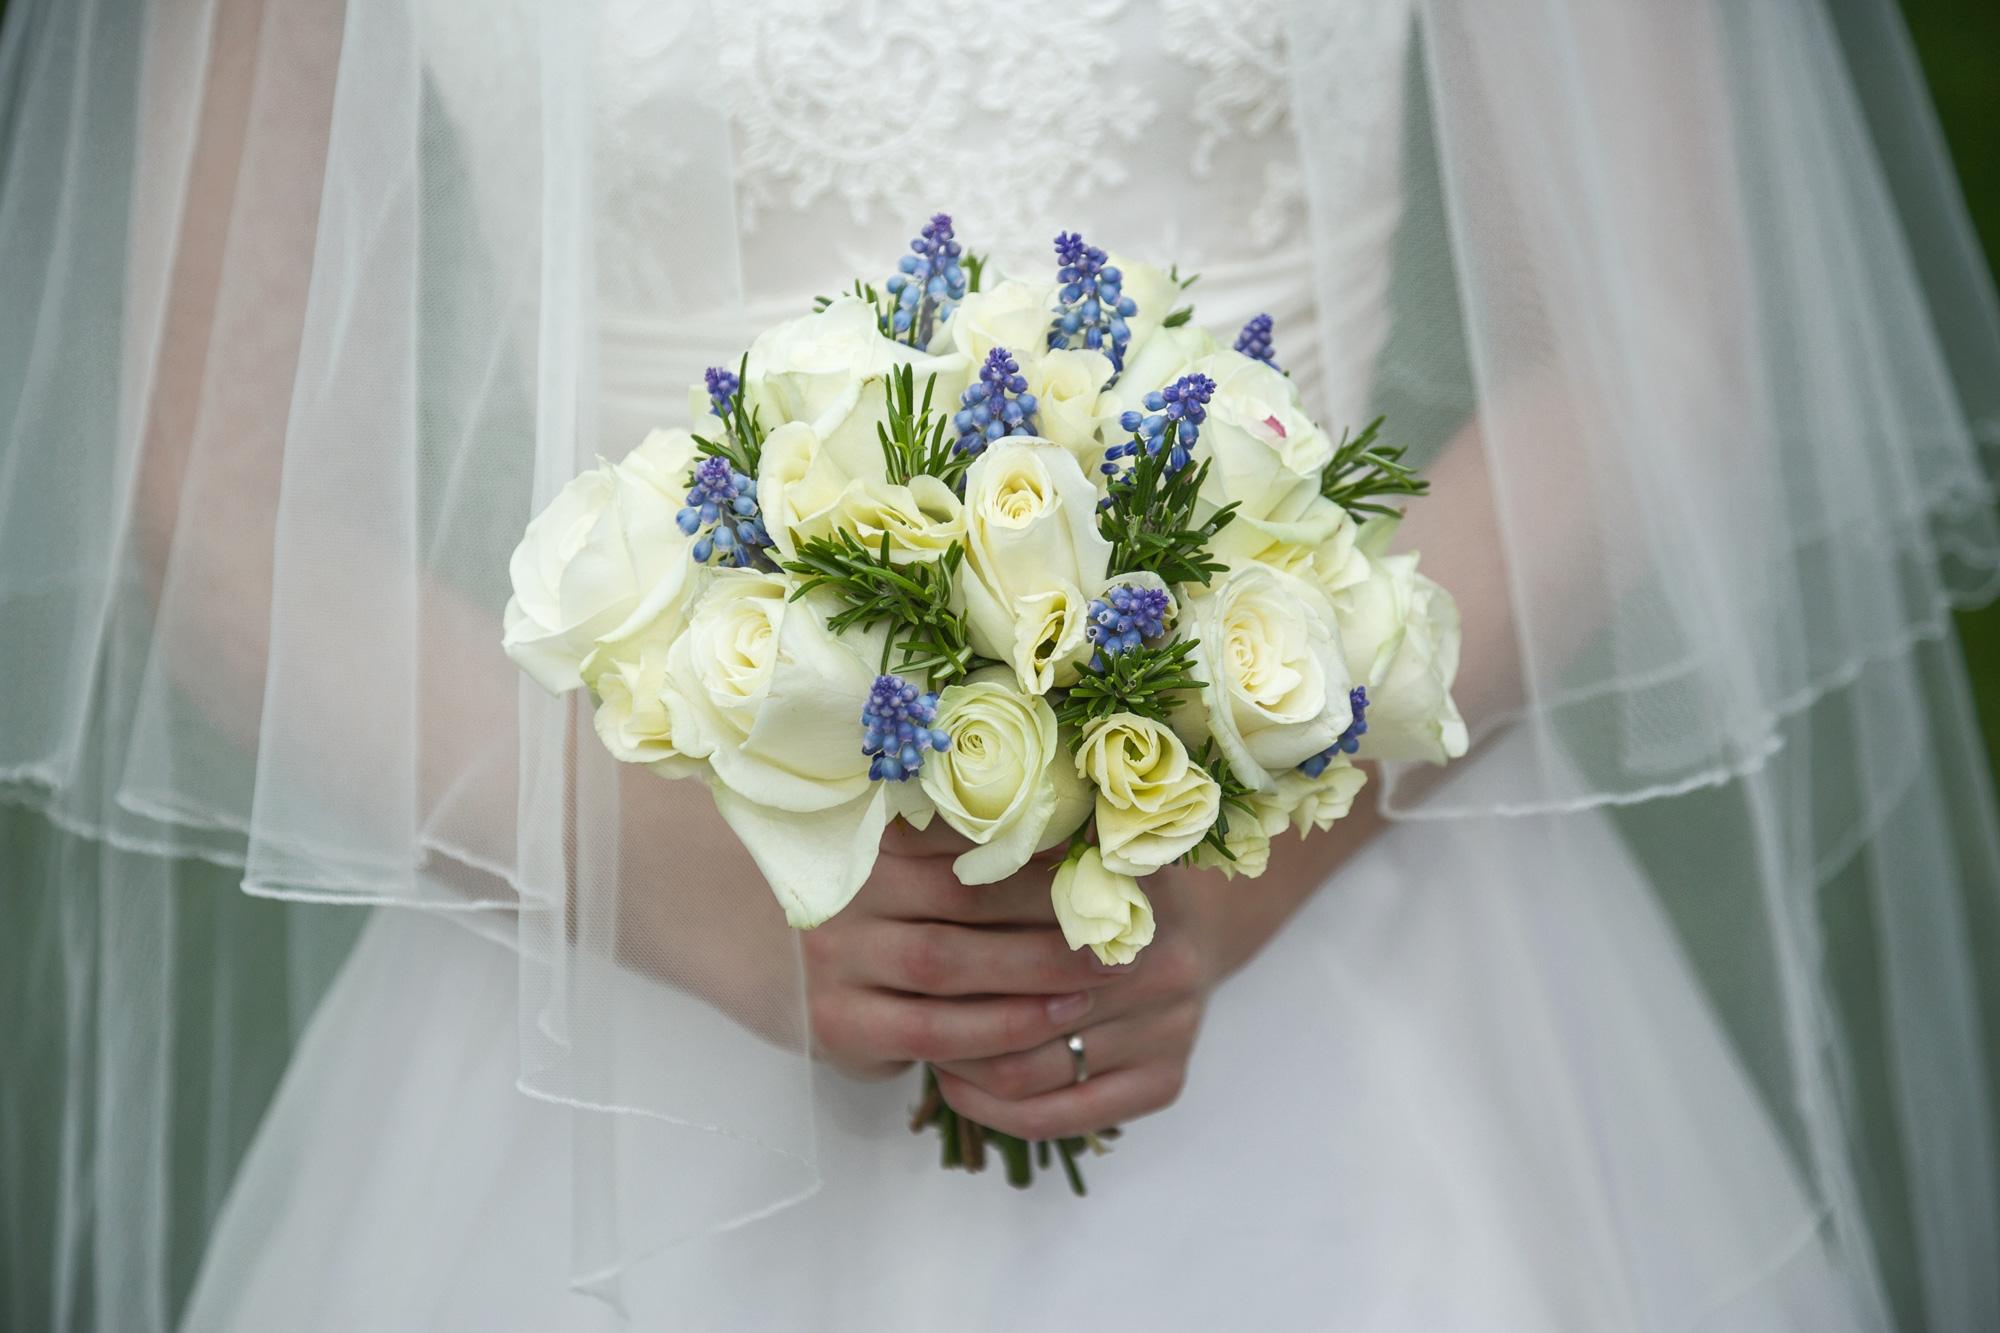 Adam_Hillier_Wedding_Photographer_Newbury_Berkshire_6.jpg